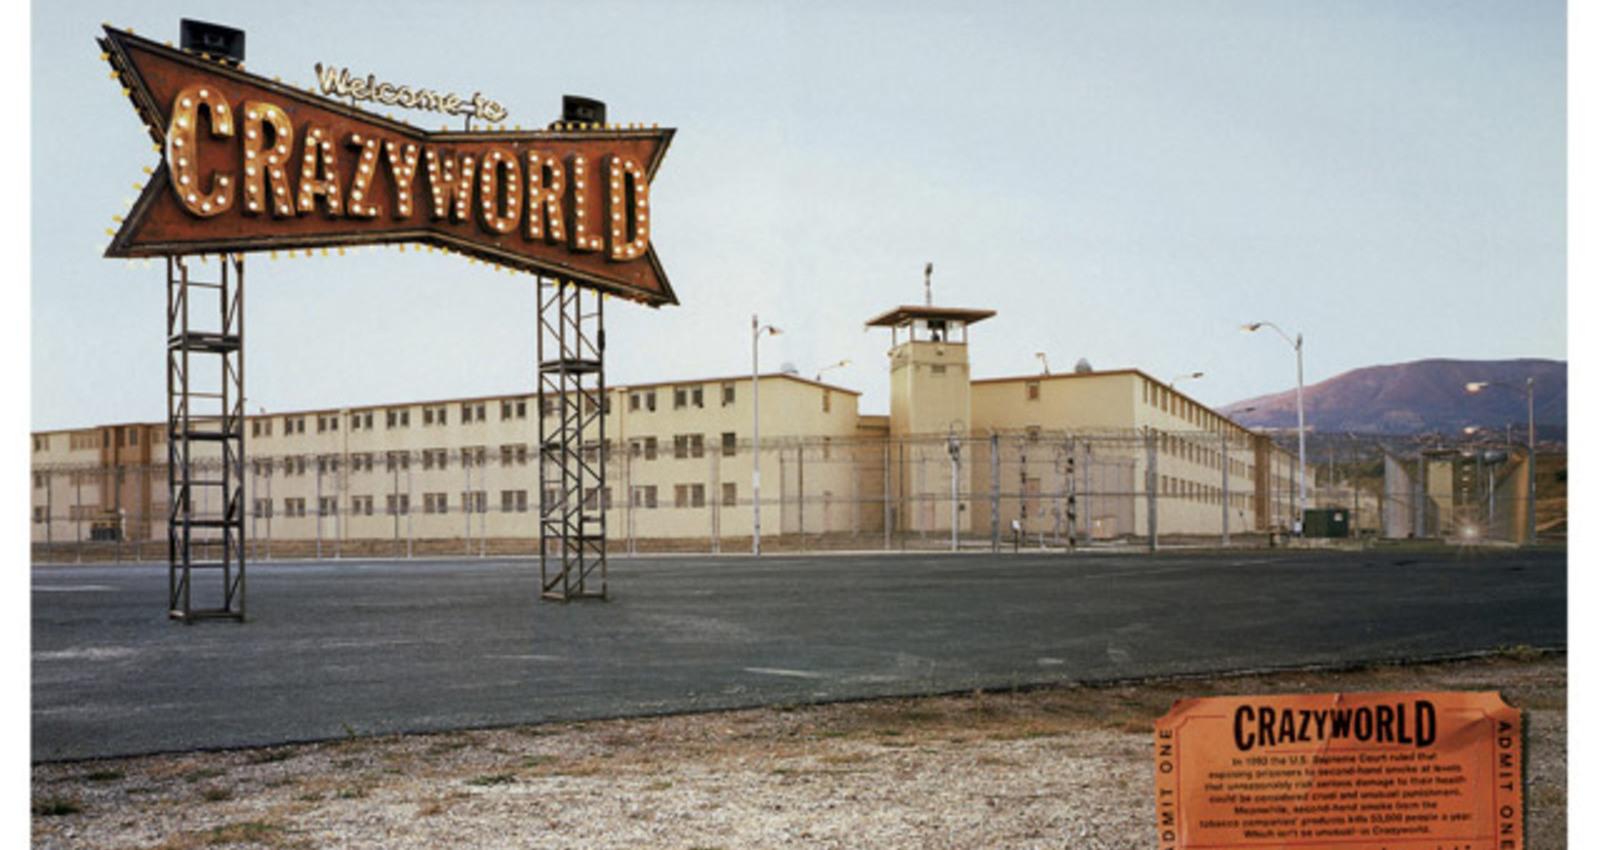 Supermarket, Grapes, Prison